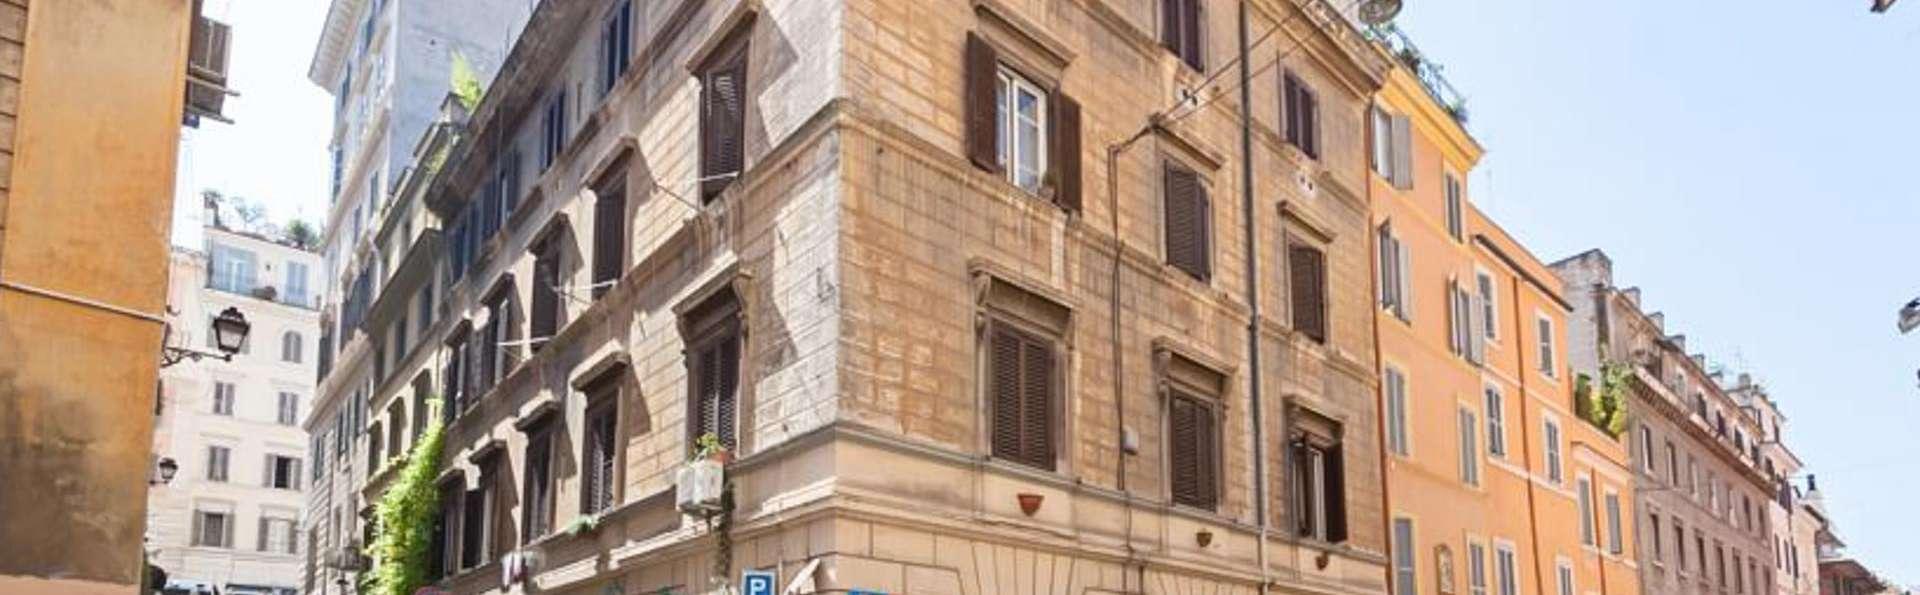 Relais Monti - EDIT_FRONT_02.jpg